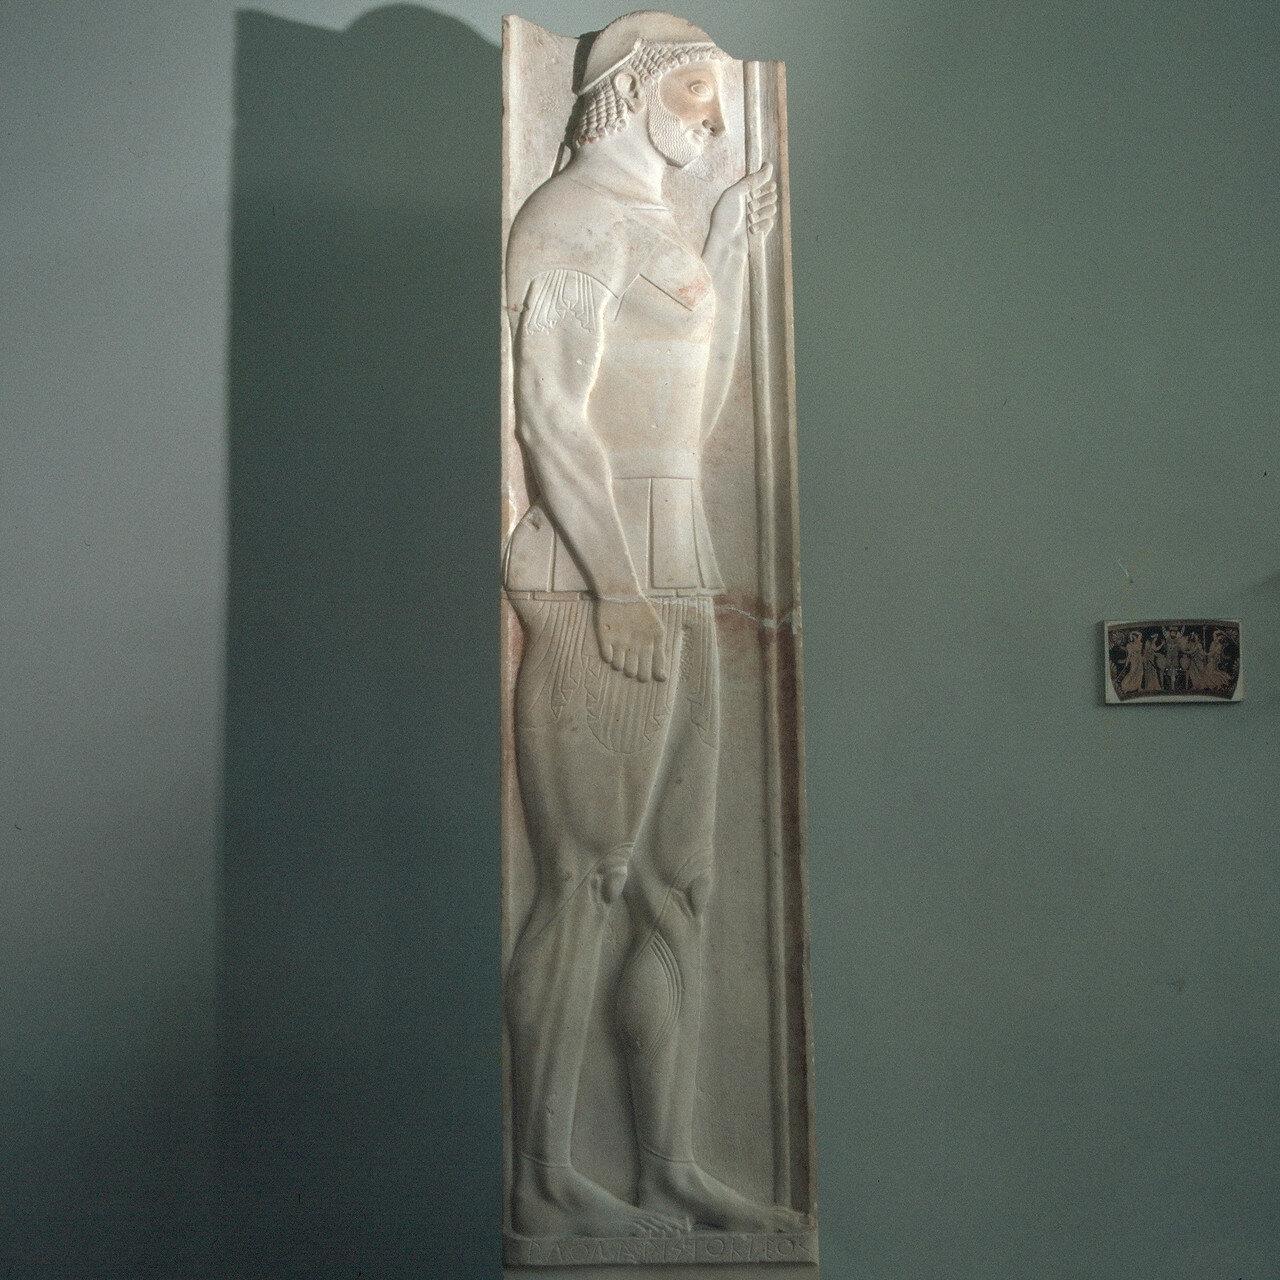 Стела Аристиона. Архаический гоплит в хитоне, шлеме, доспехах и с копьем. Мрамор. Конец VI в. до н. э.